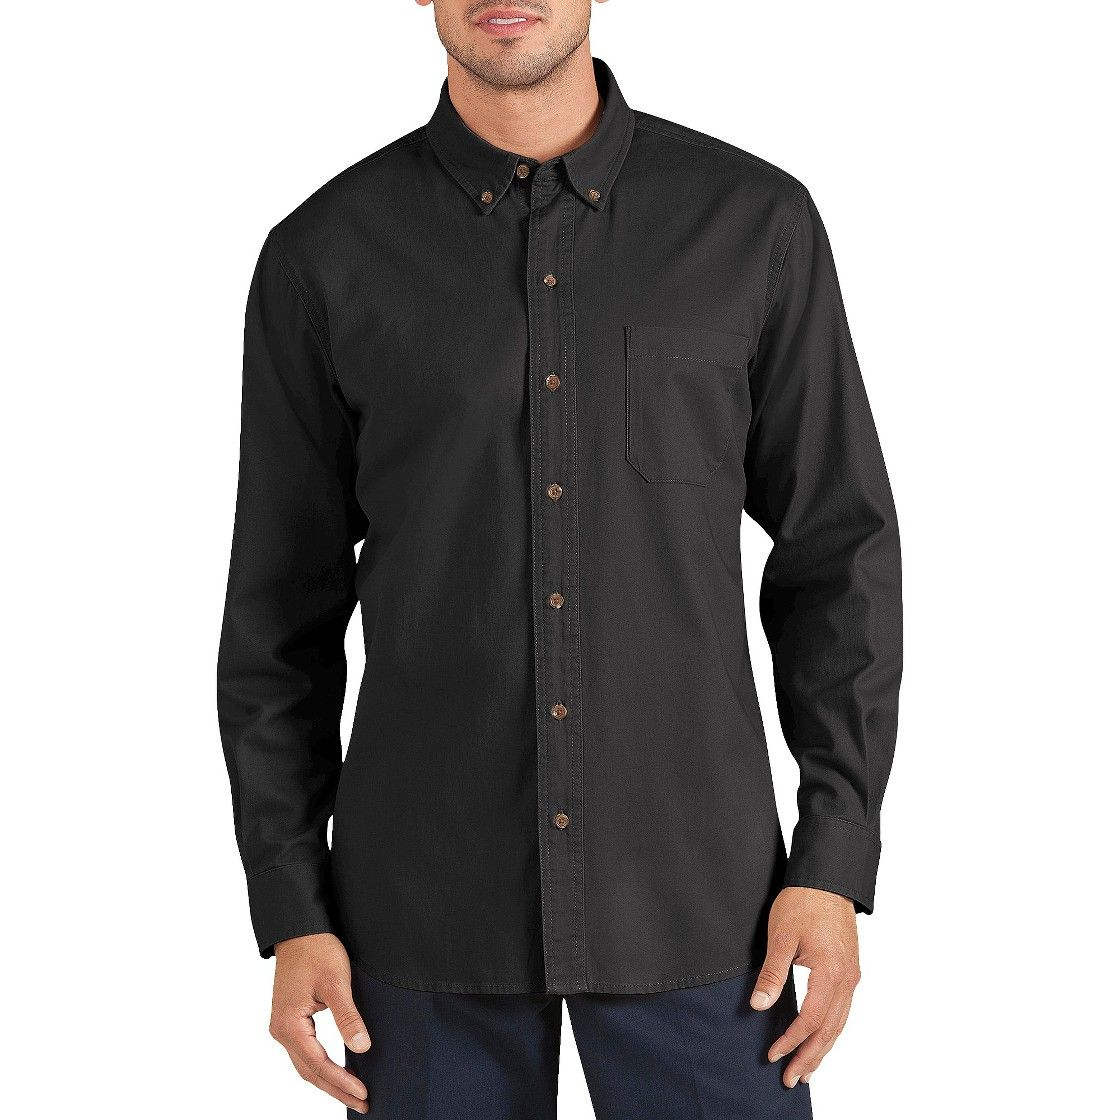 Wedding dress shirts for men  Dickies  Menus Regular Fit Cotton Twill Long Sleeve ButtonDown